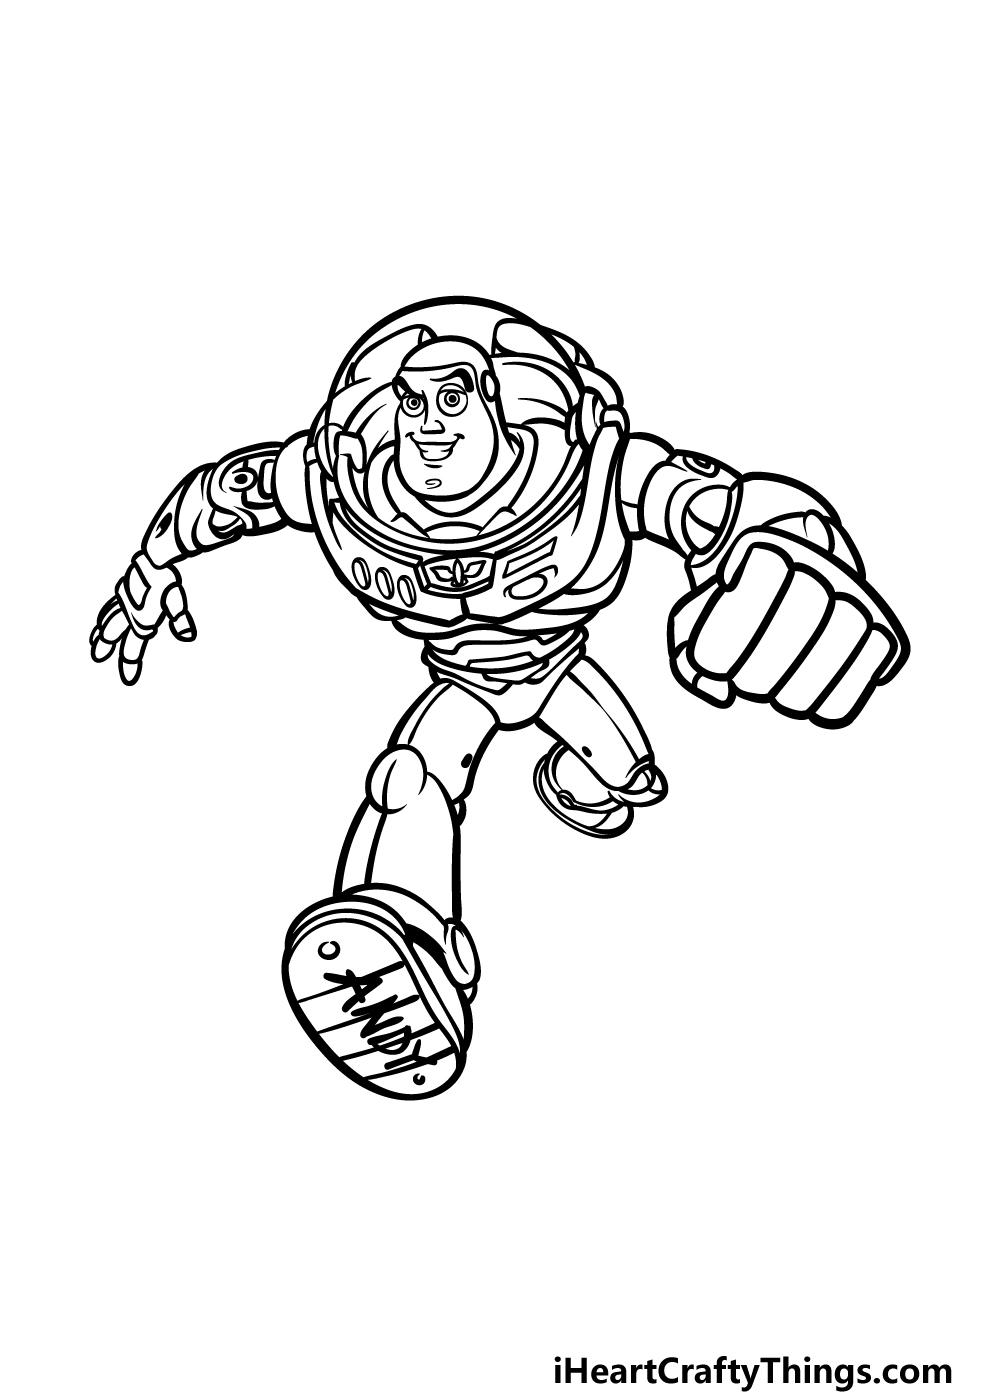 drawing Buzz Lightyear step 5